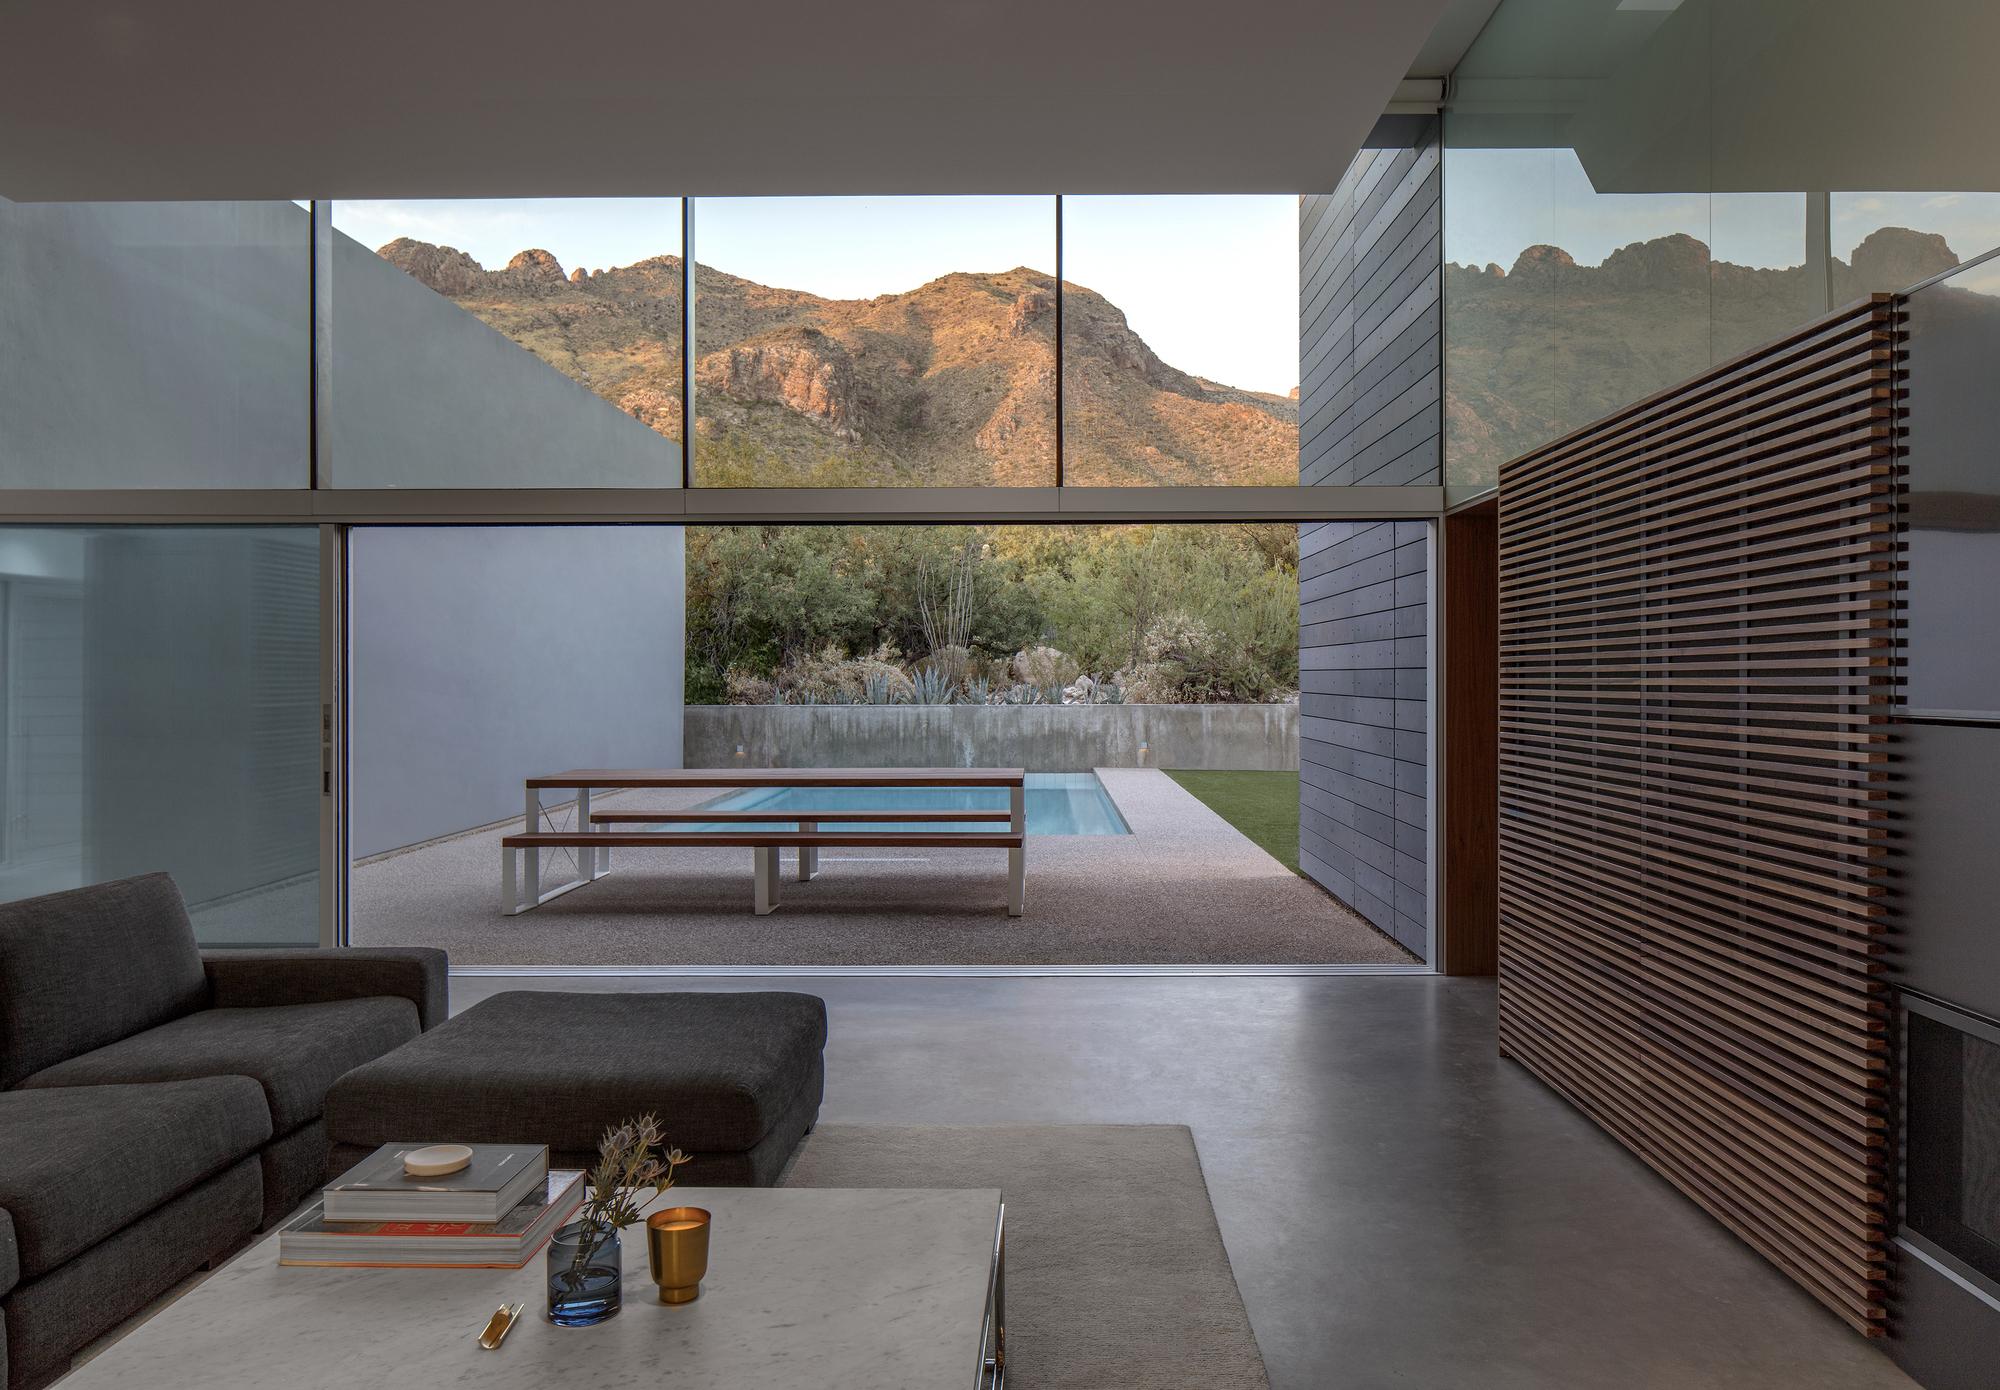 the living room with sky bar %e4%b8%80%e4%bc%91 glass cabinets for https www archdaily com 886261 residence zeta peruzzo 29025 livingroomdetai jpg 1532446911